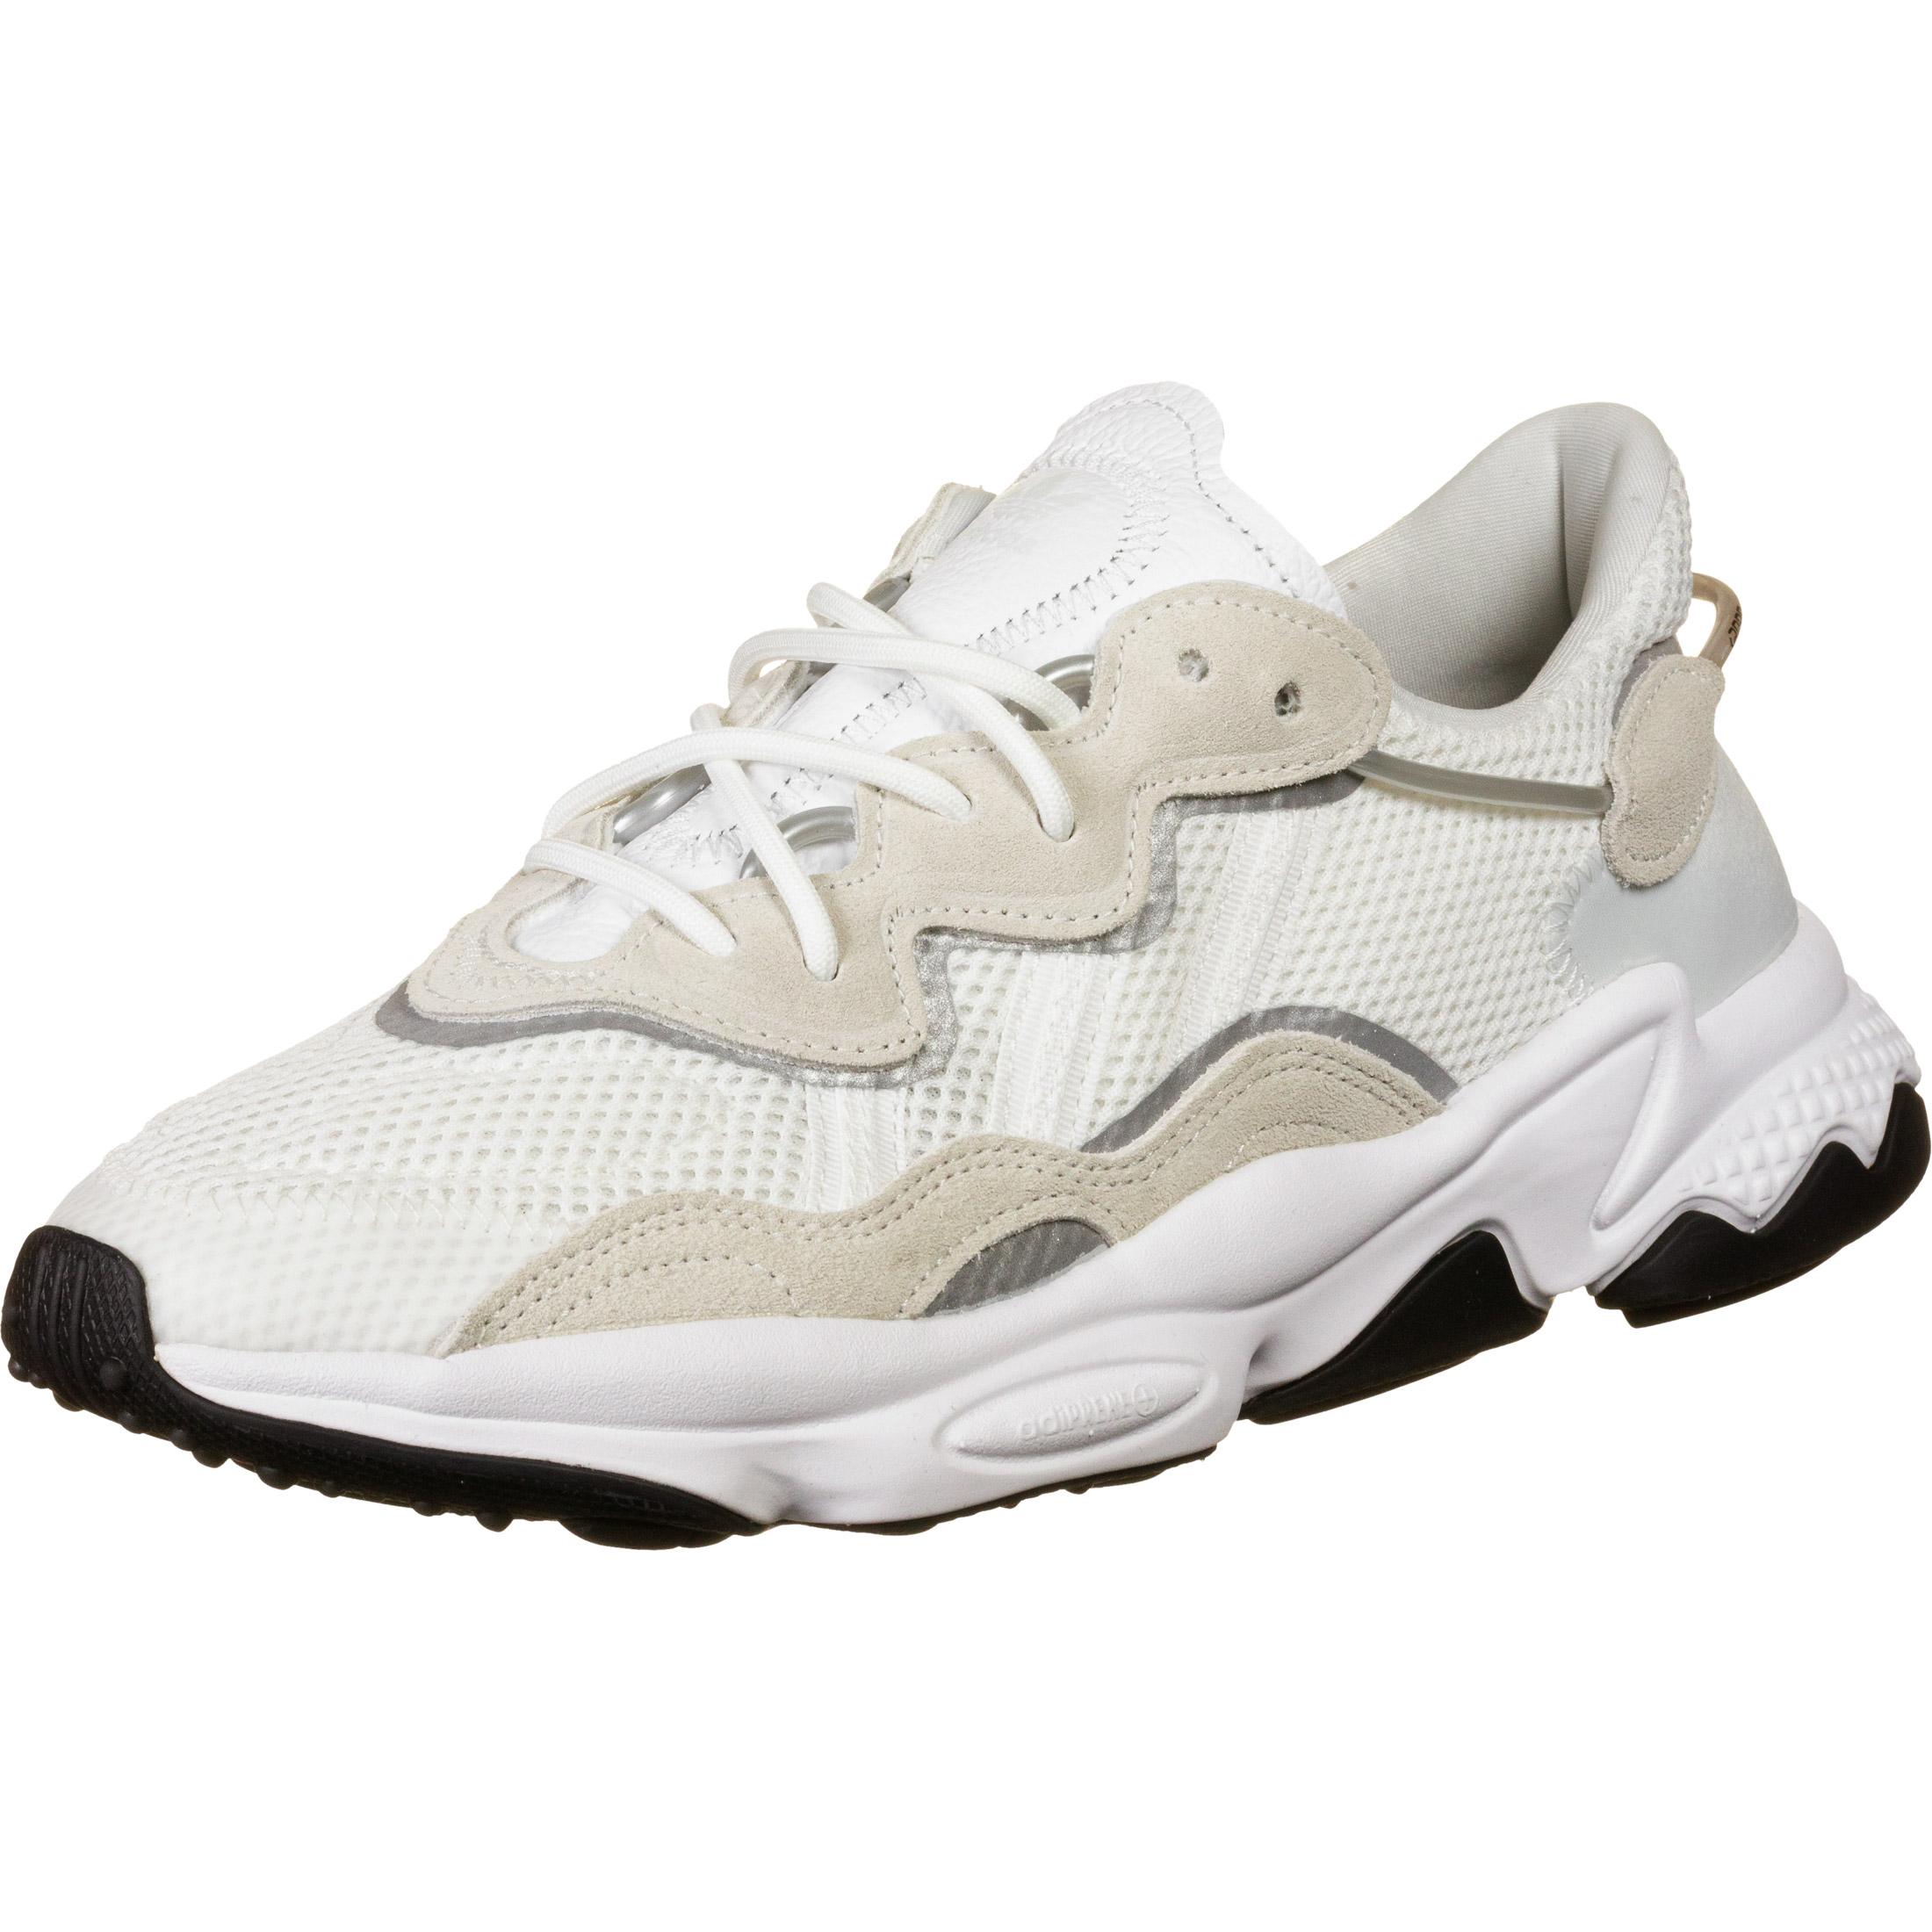 Chaussures Ozweego Blanc   adidas France